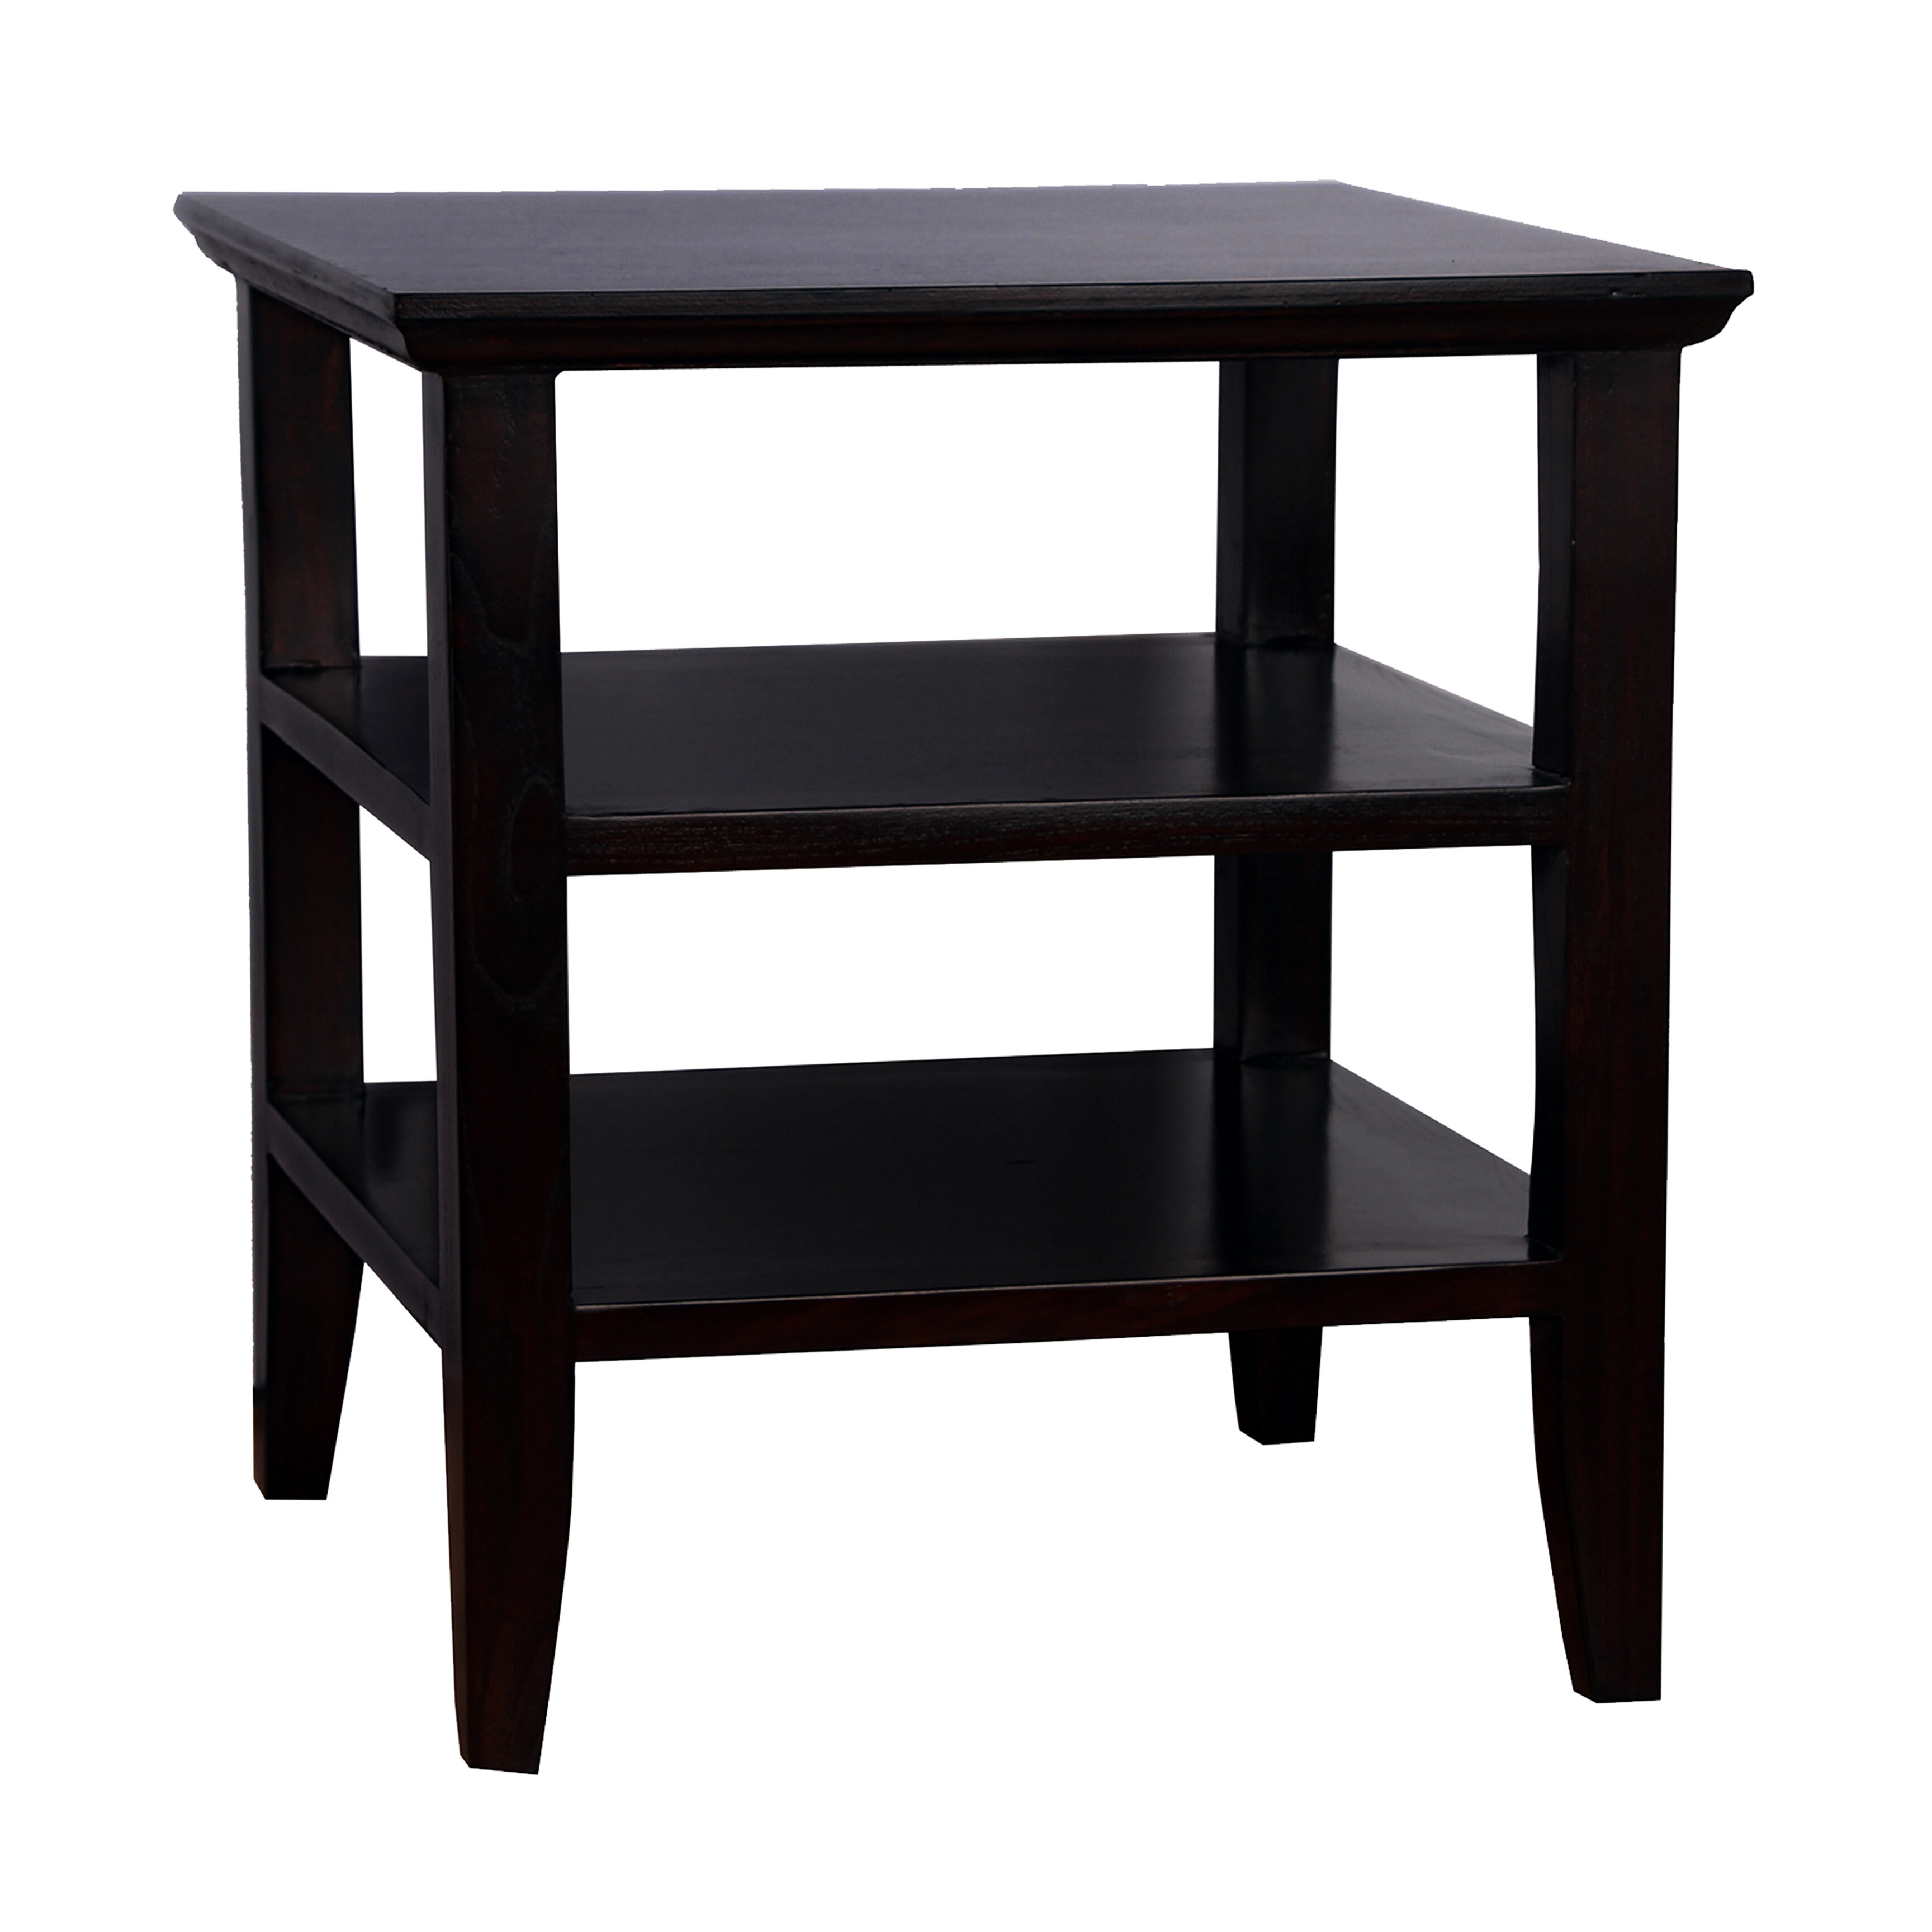 Porthos Home Akira End Table Reviews Wayfair